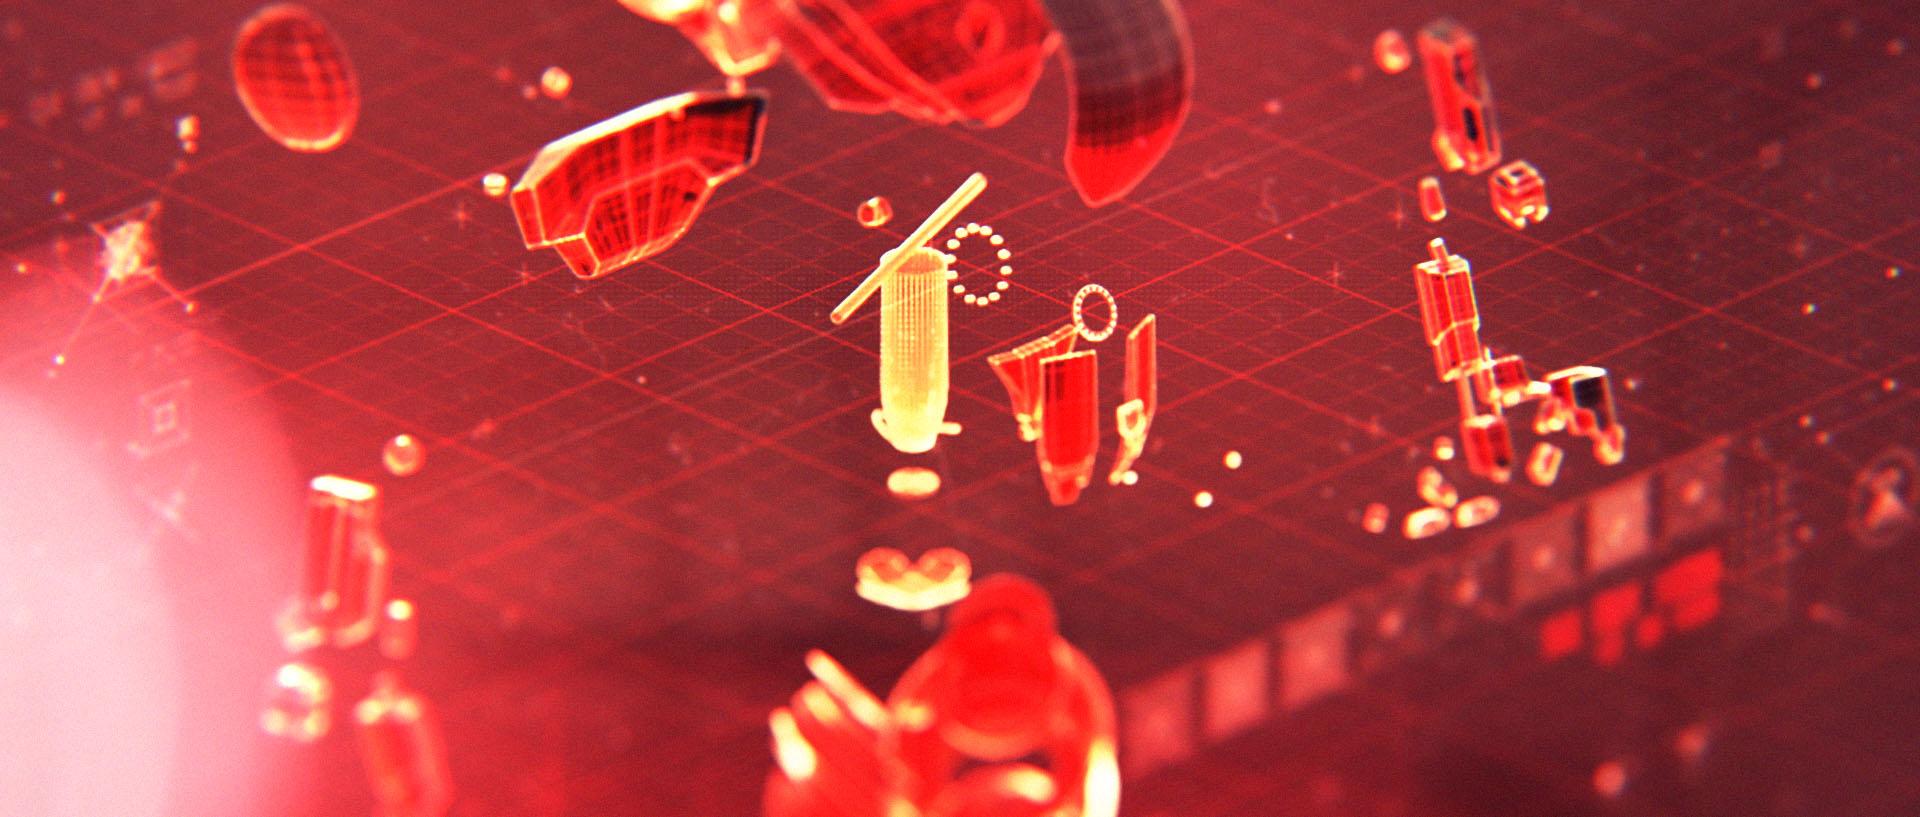 Sci-Fi-London_0003_04.jpg